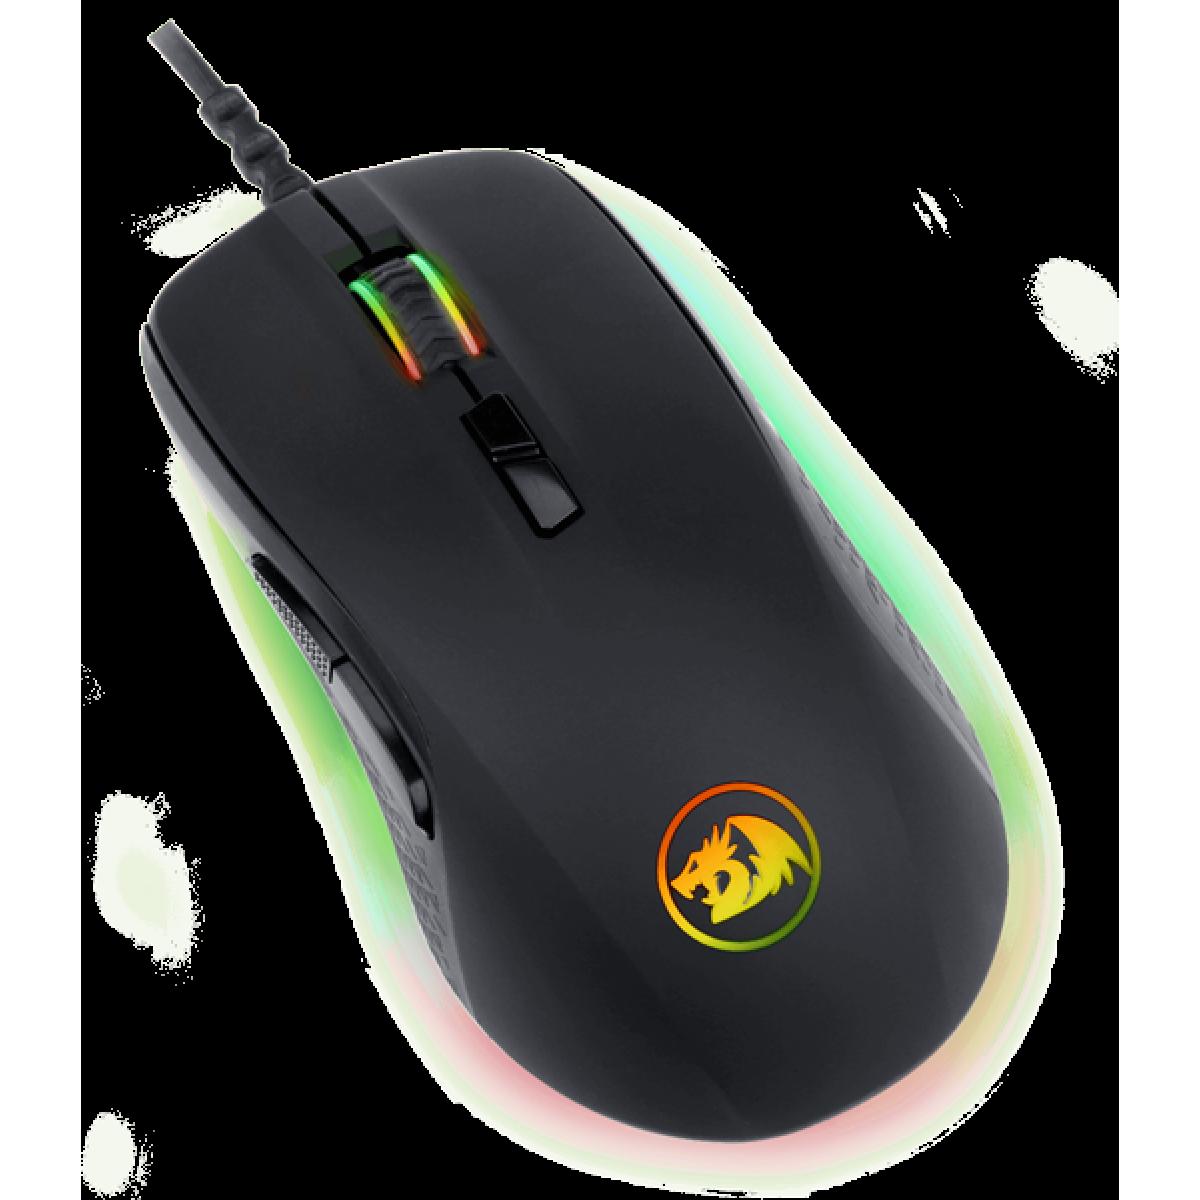 Mouse Gamer Redragon Stormrage M718 RGB, 10000 DPI, 7 Botões Programáveis, Black